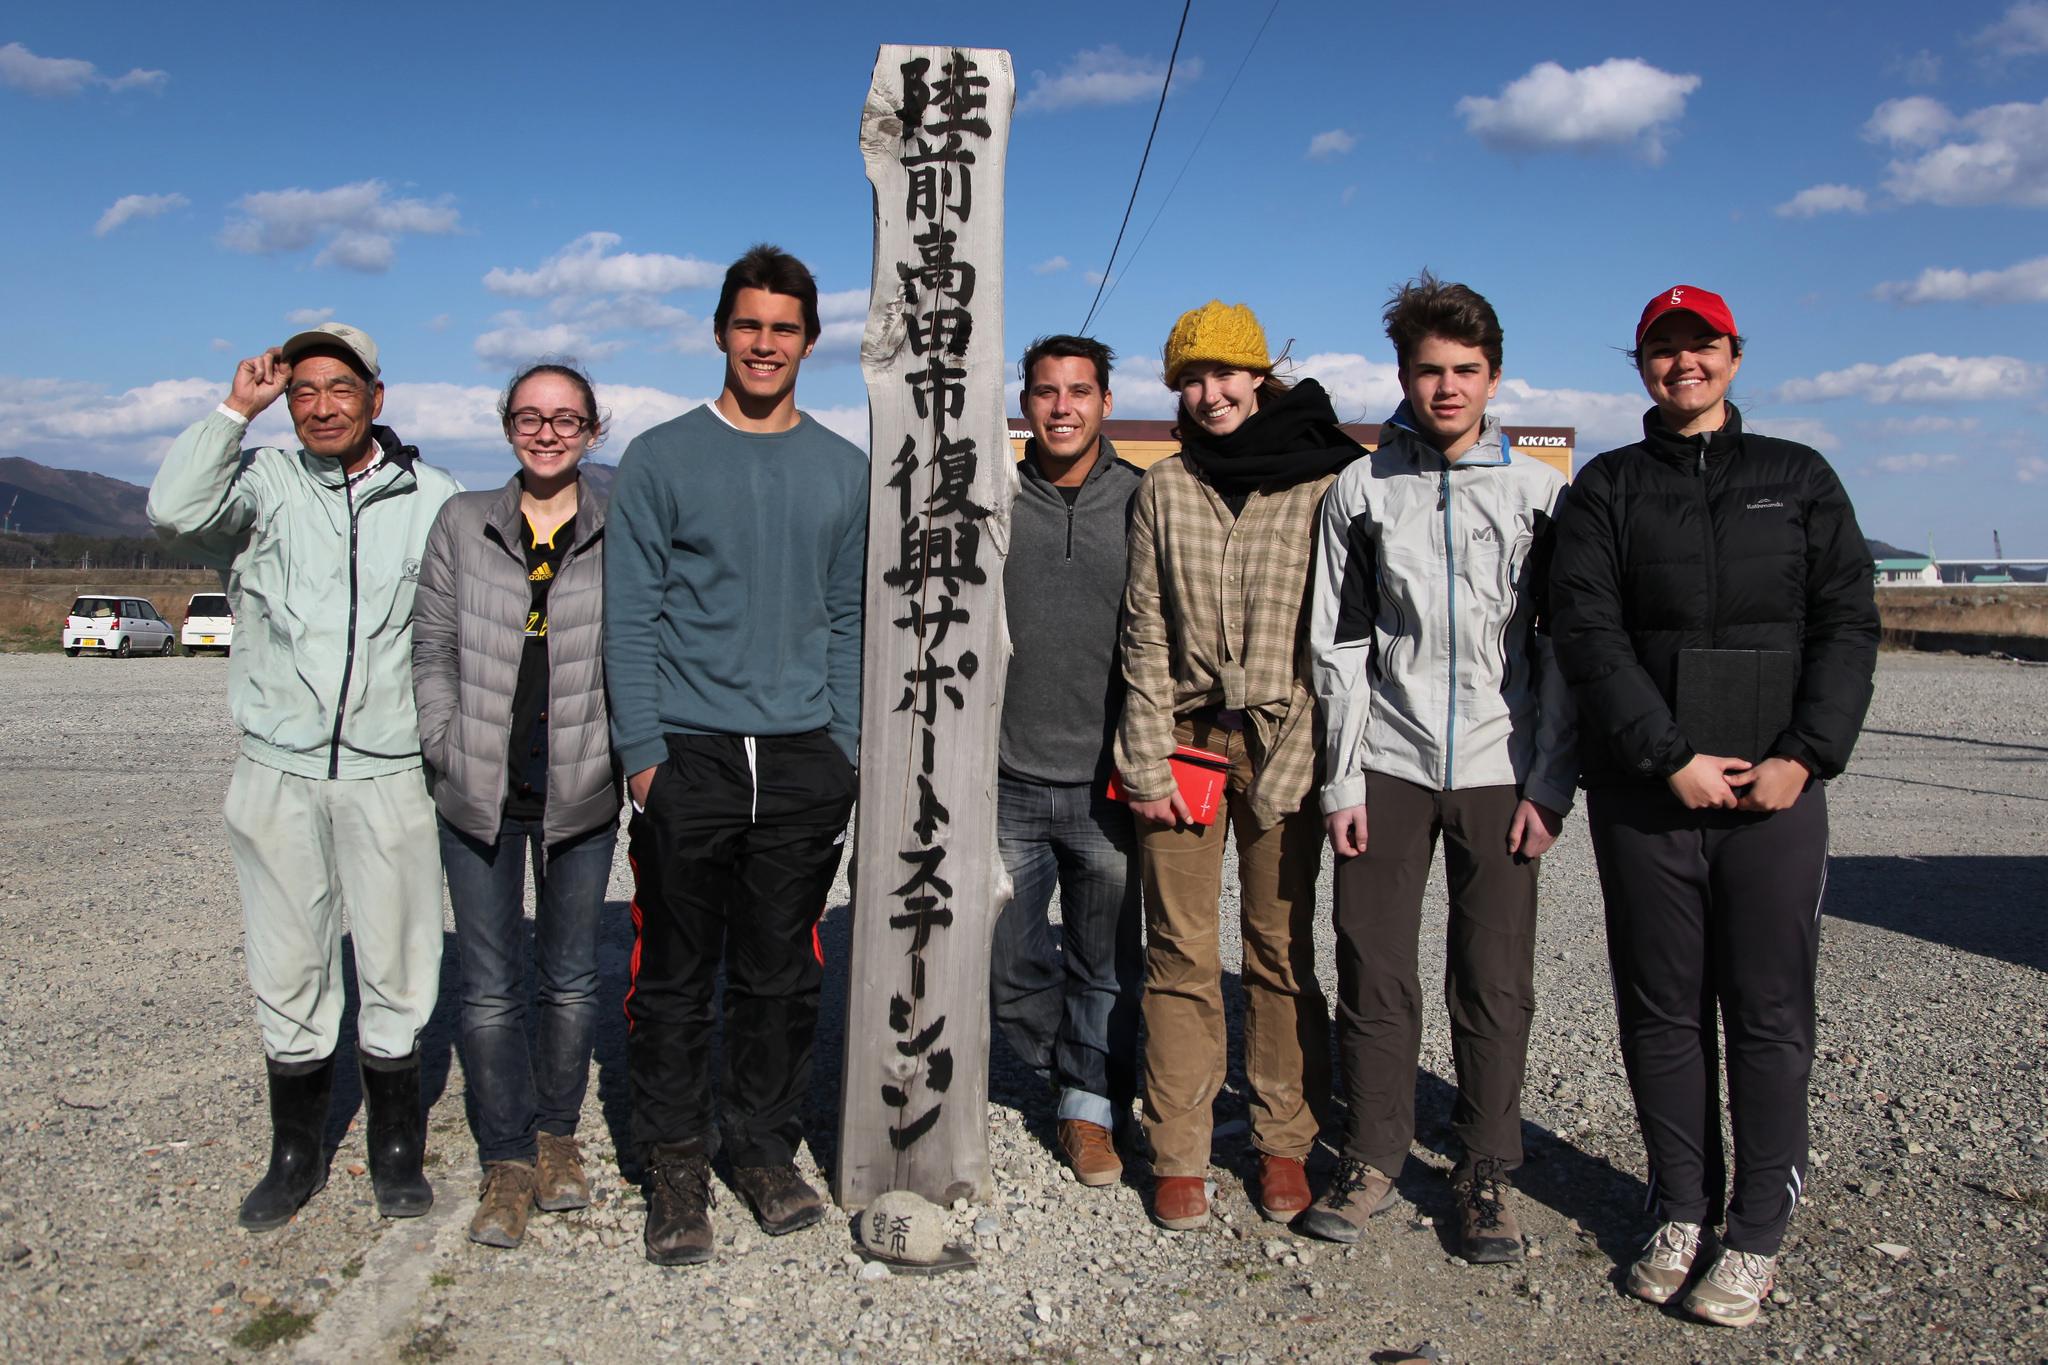 With Team Tohoku in Rikuzentakata